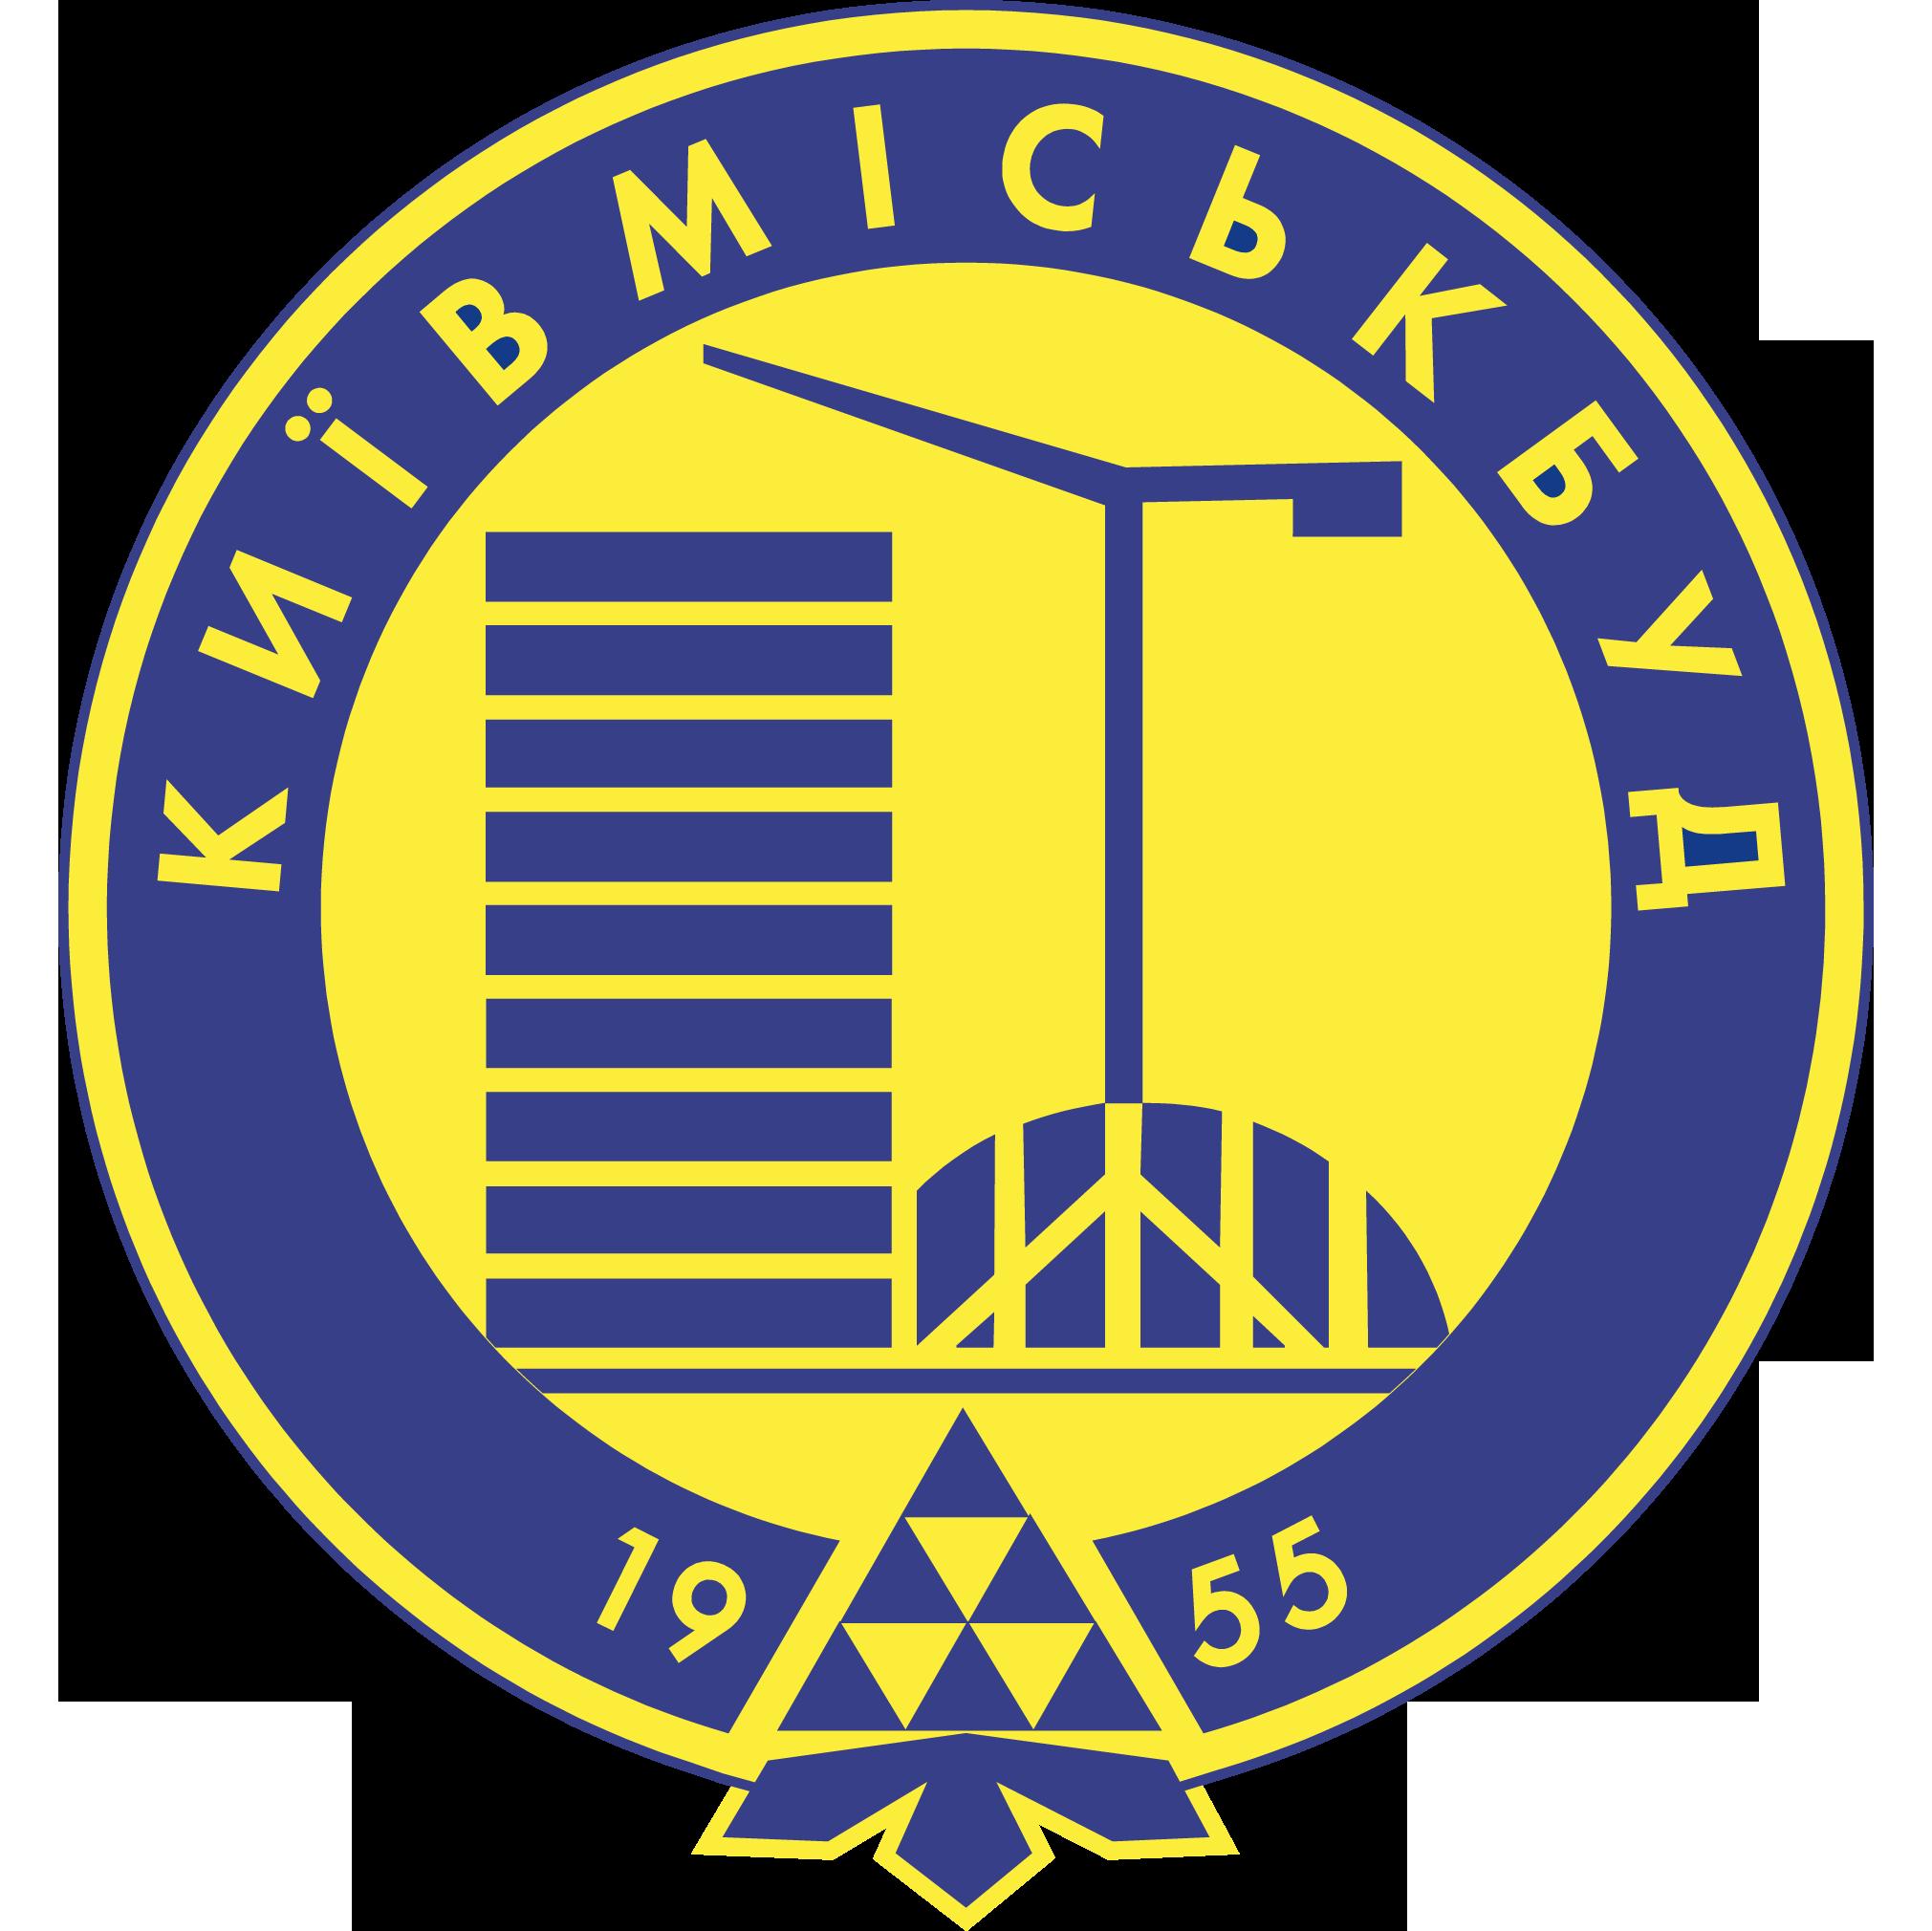 київміськбуд найдежній застройщик в Киеве